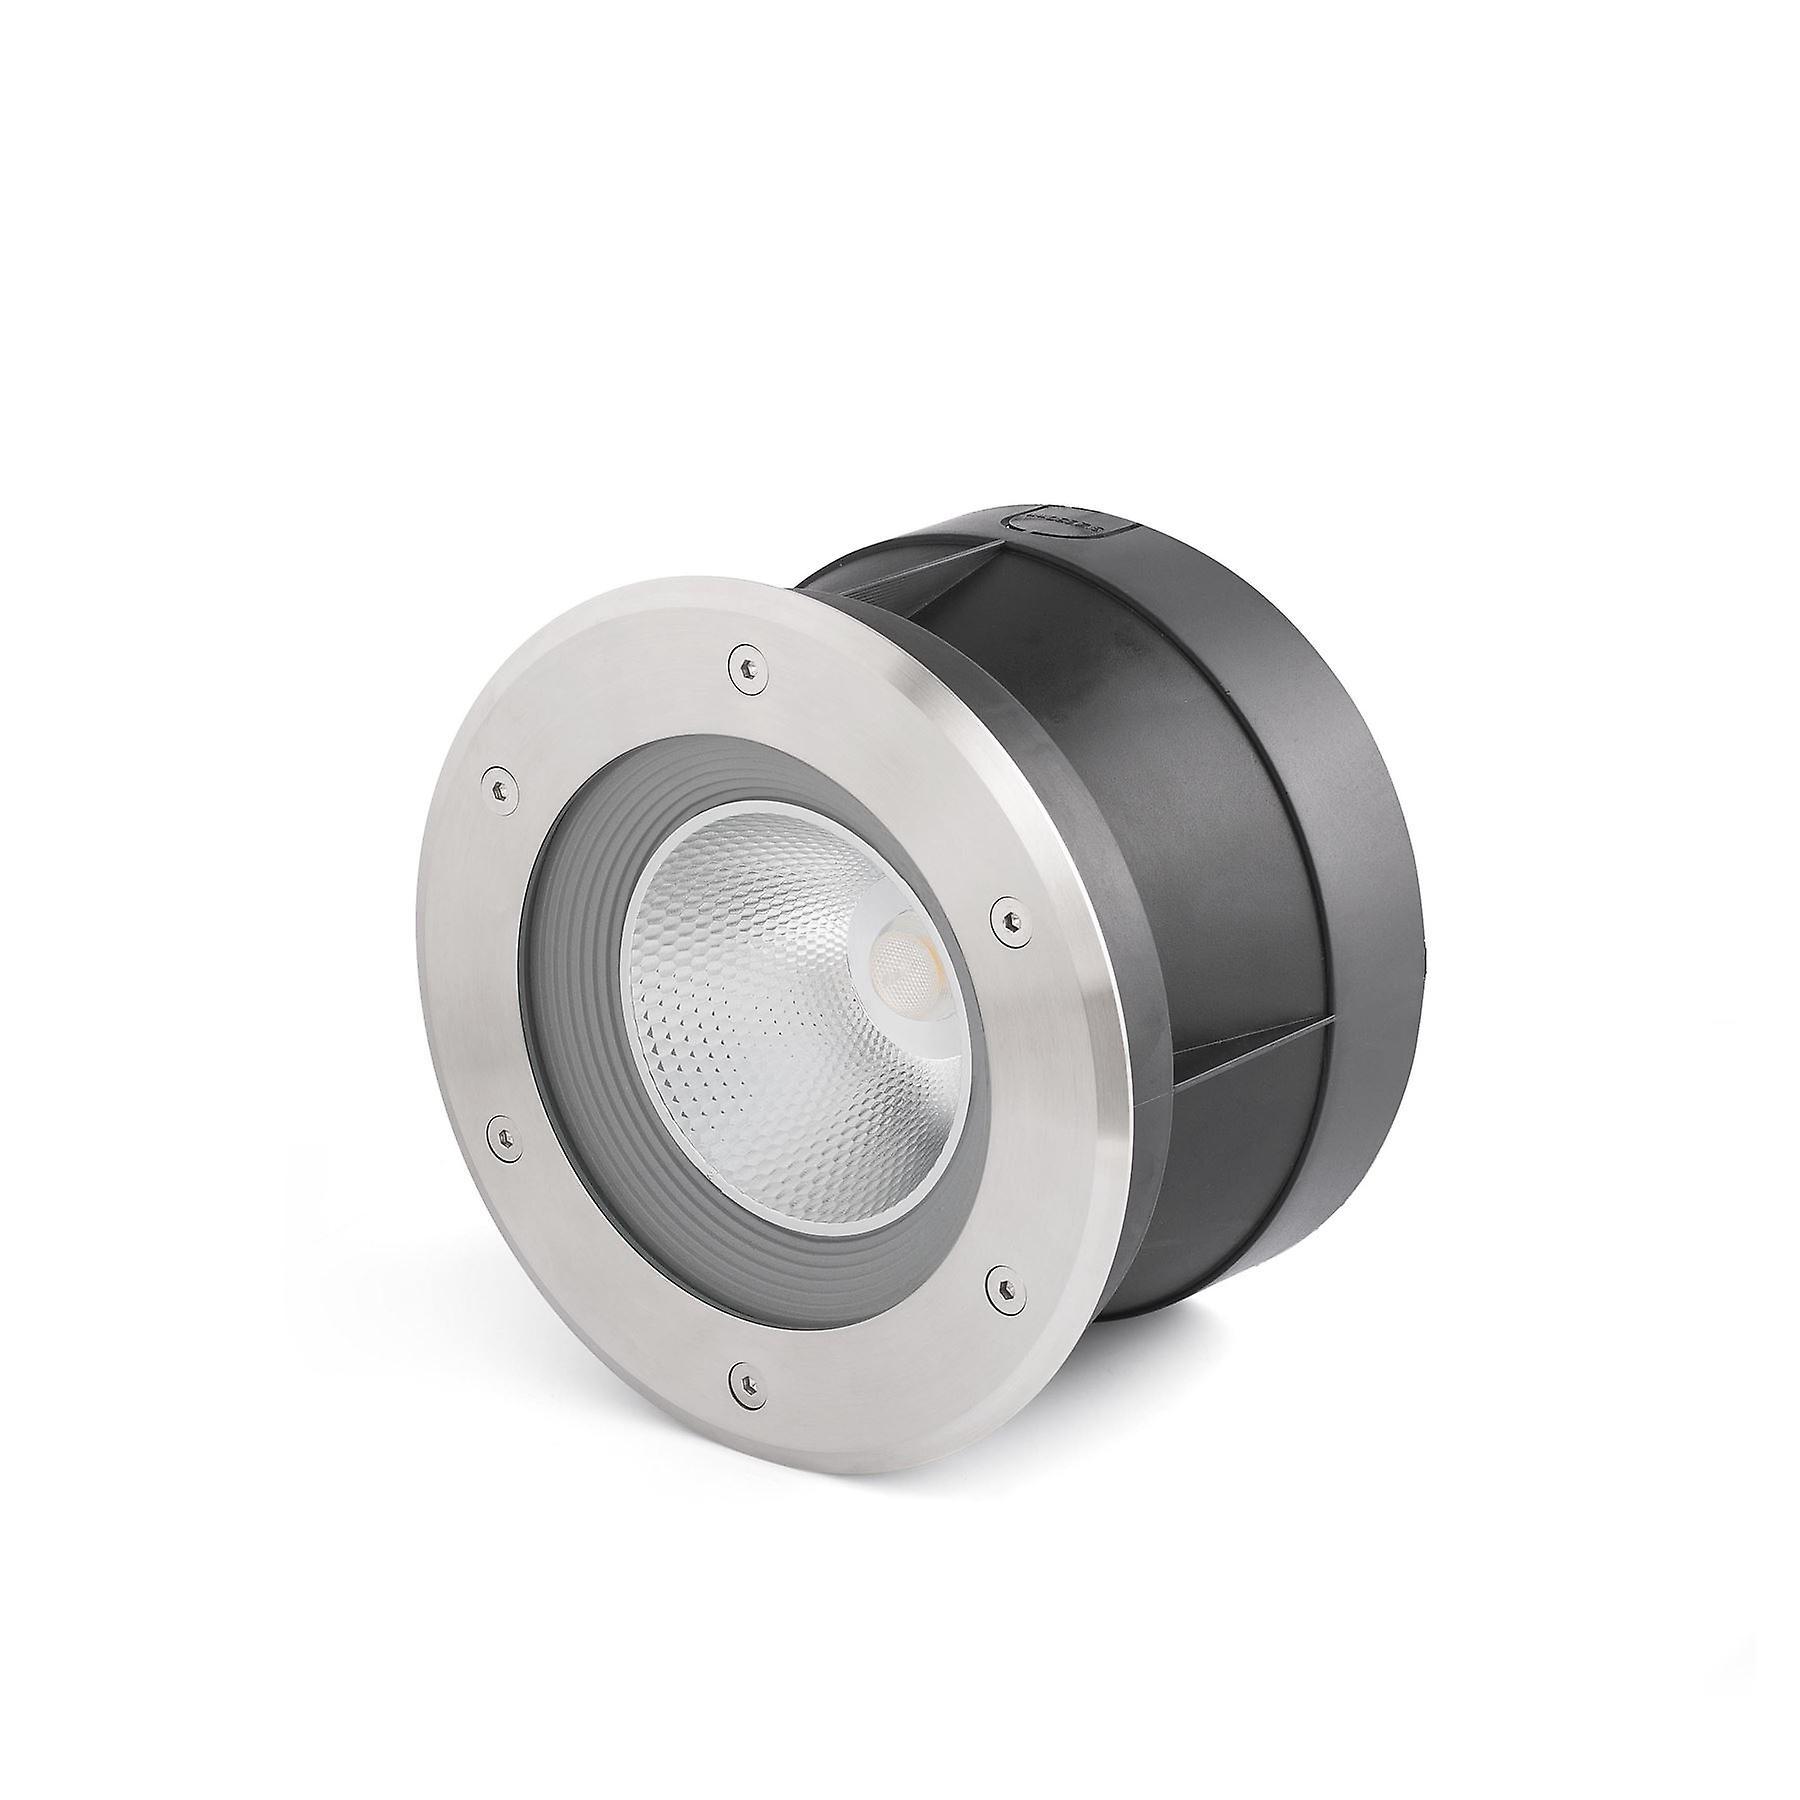 Faro - Suria-24 Matt Nickel LED Recessed de plein air Spotlumière - grand Beam Angle FARO70587